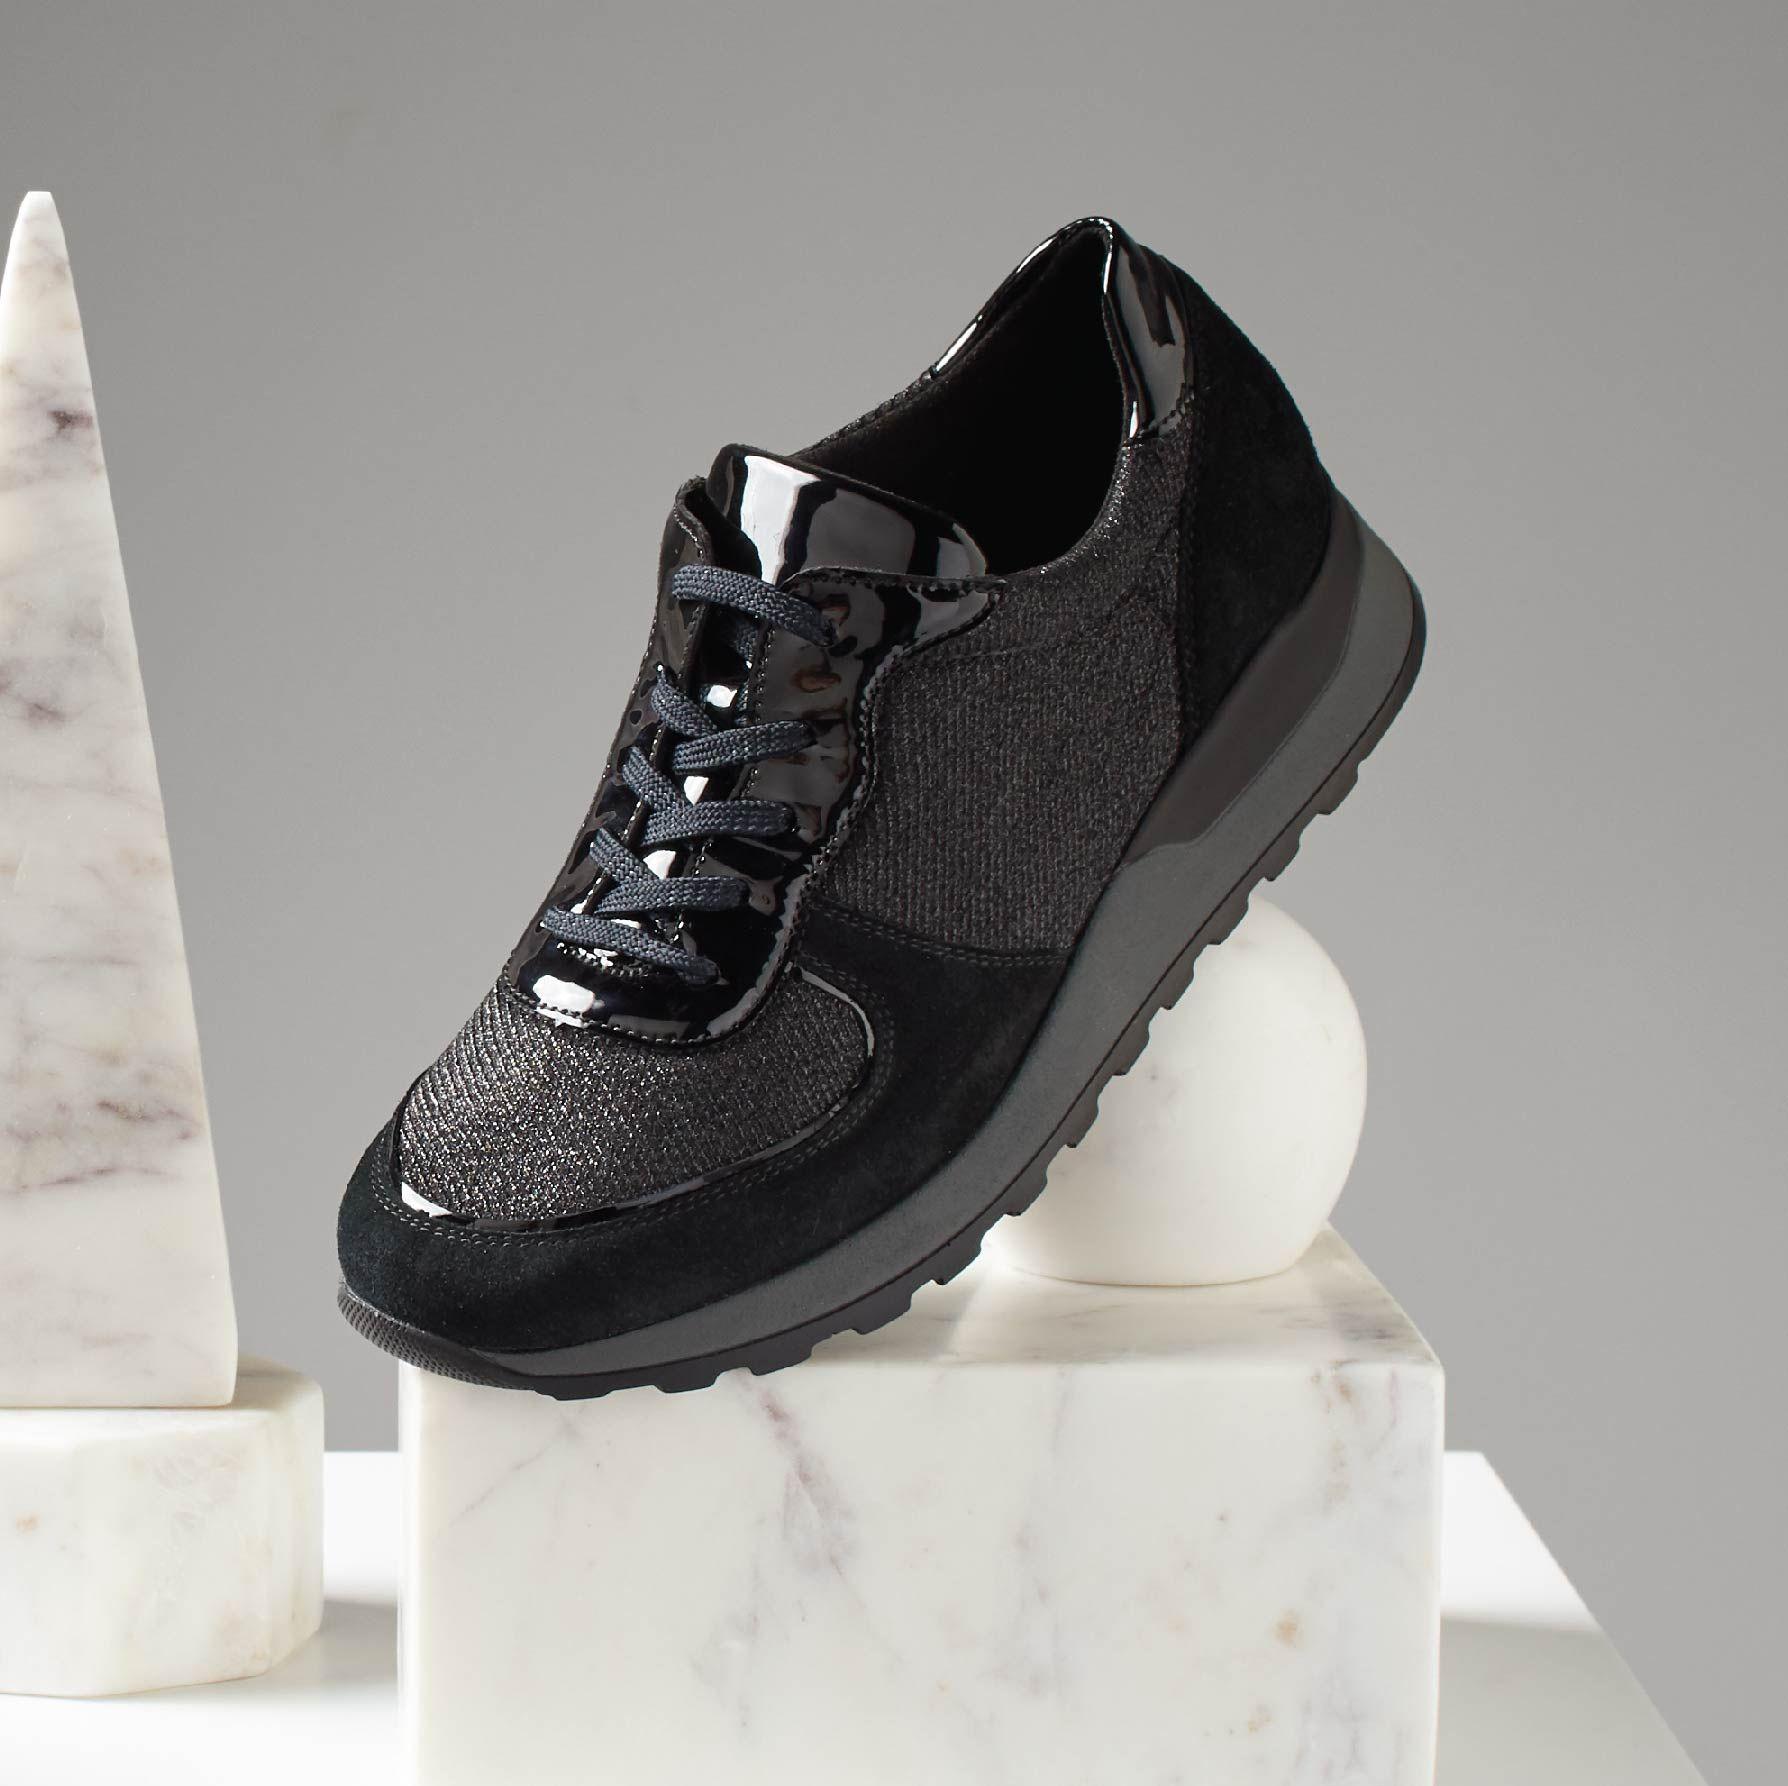 pretty nice 4853f aa9bb Waldlaufer welty | Autumn Winter 2018 | Sneakers nike, Nike ...